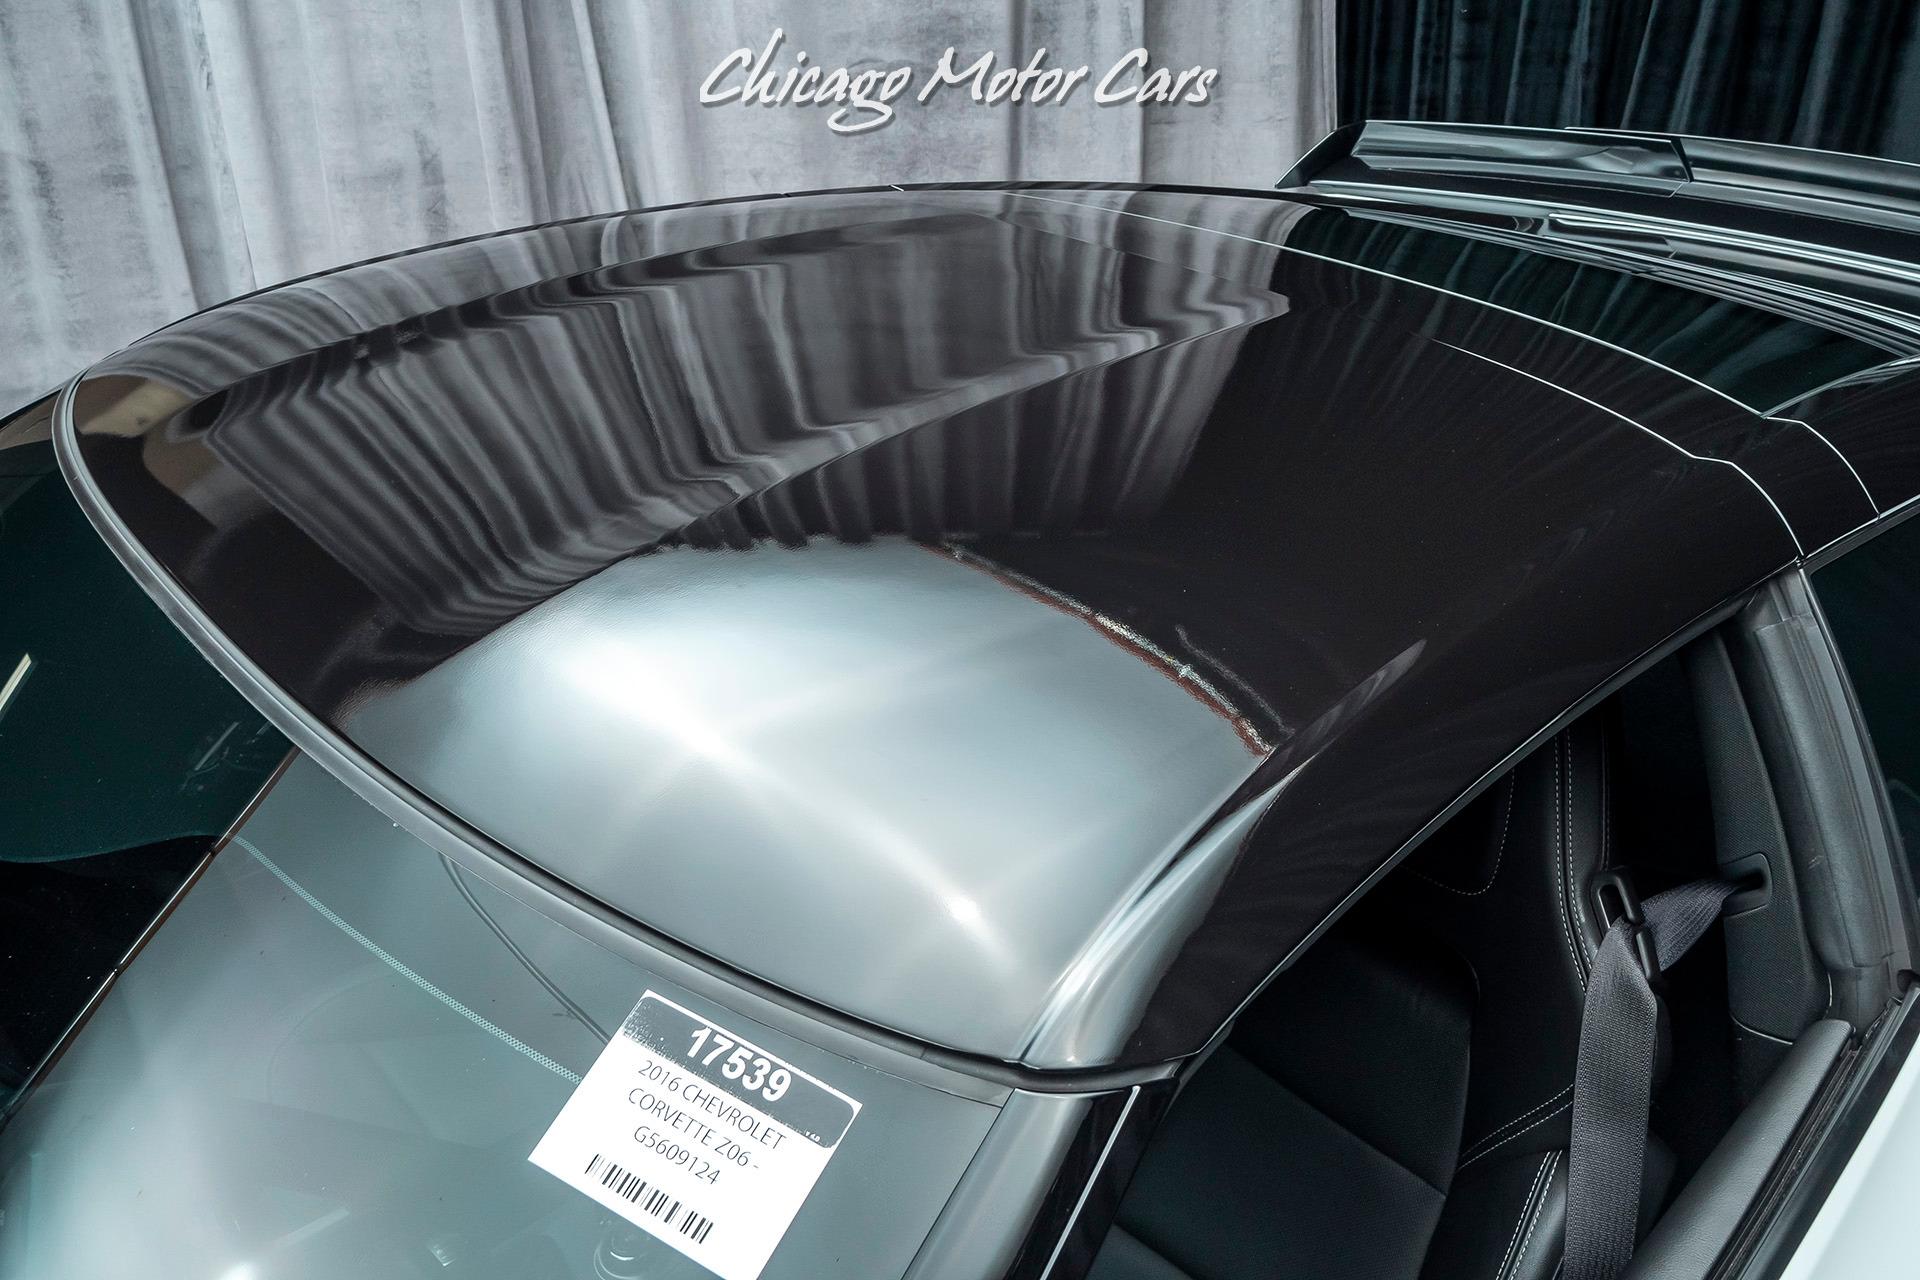 Used-2016-Chevrolet-Corvette-Z06-Arctic-Camo-Wrap-7-Speed-Manual-Performance-Video-Recorder